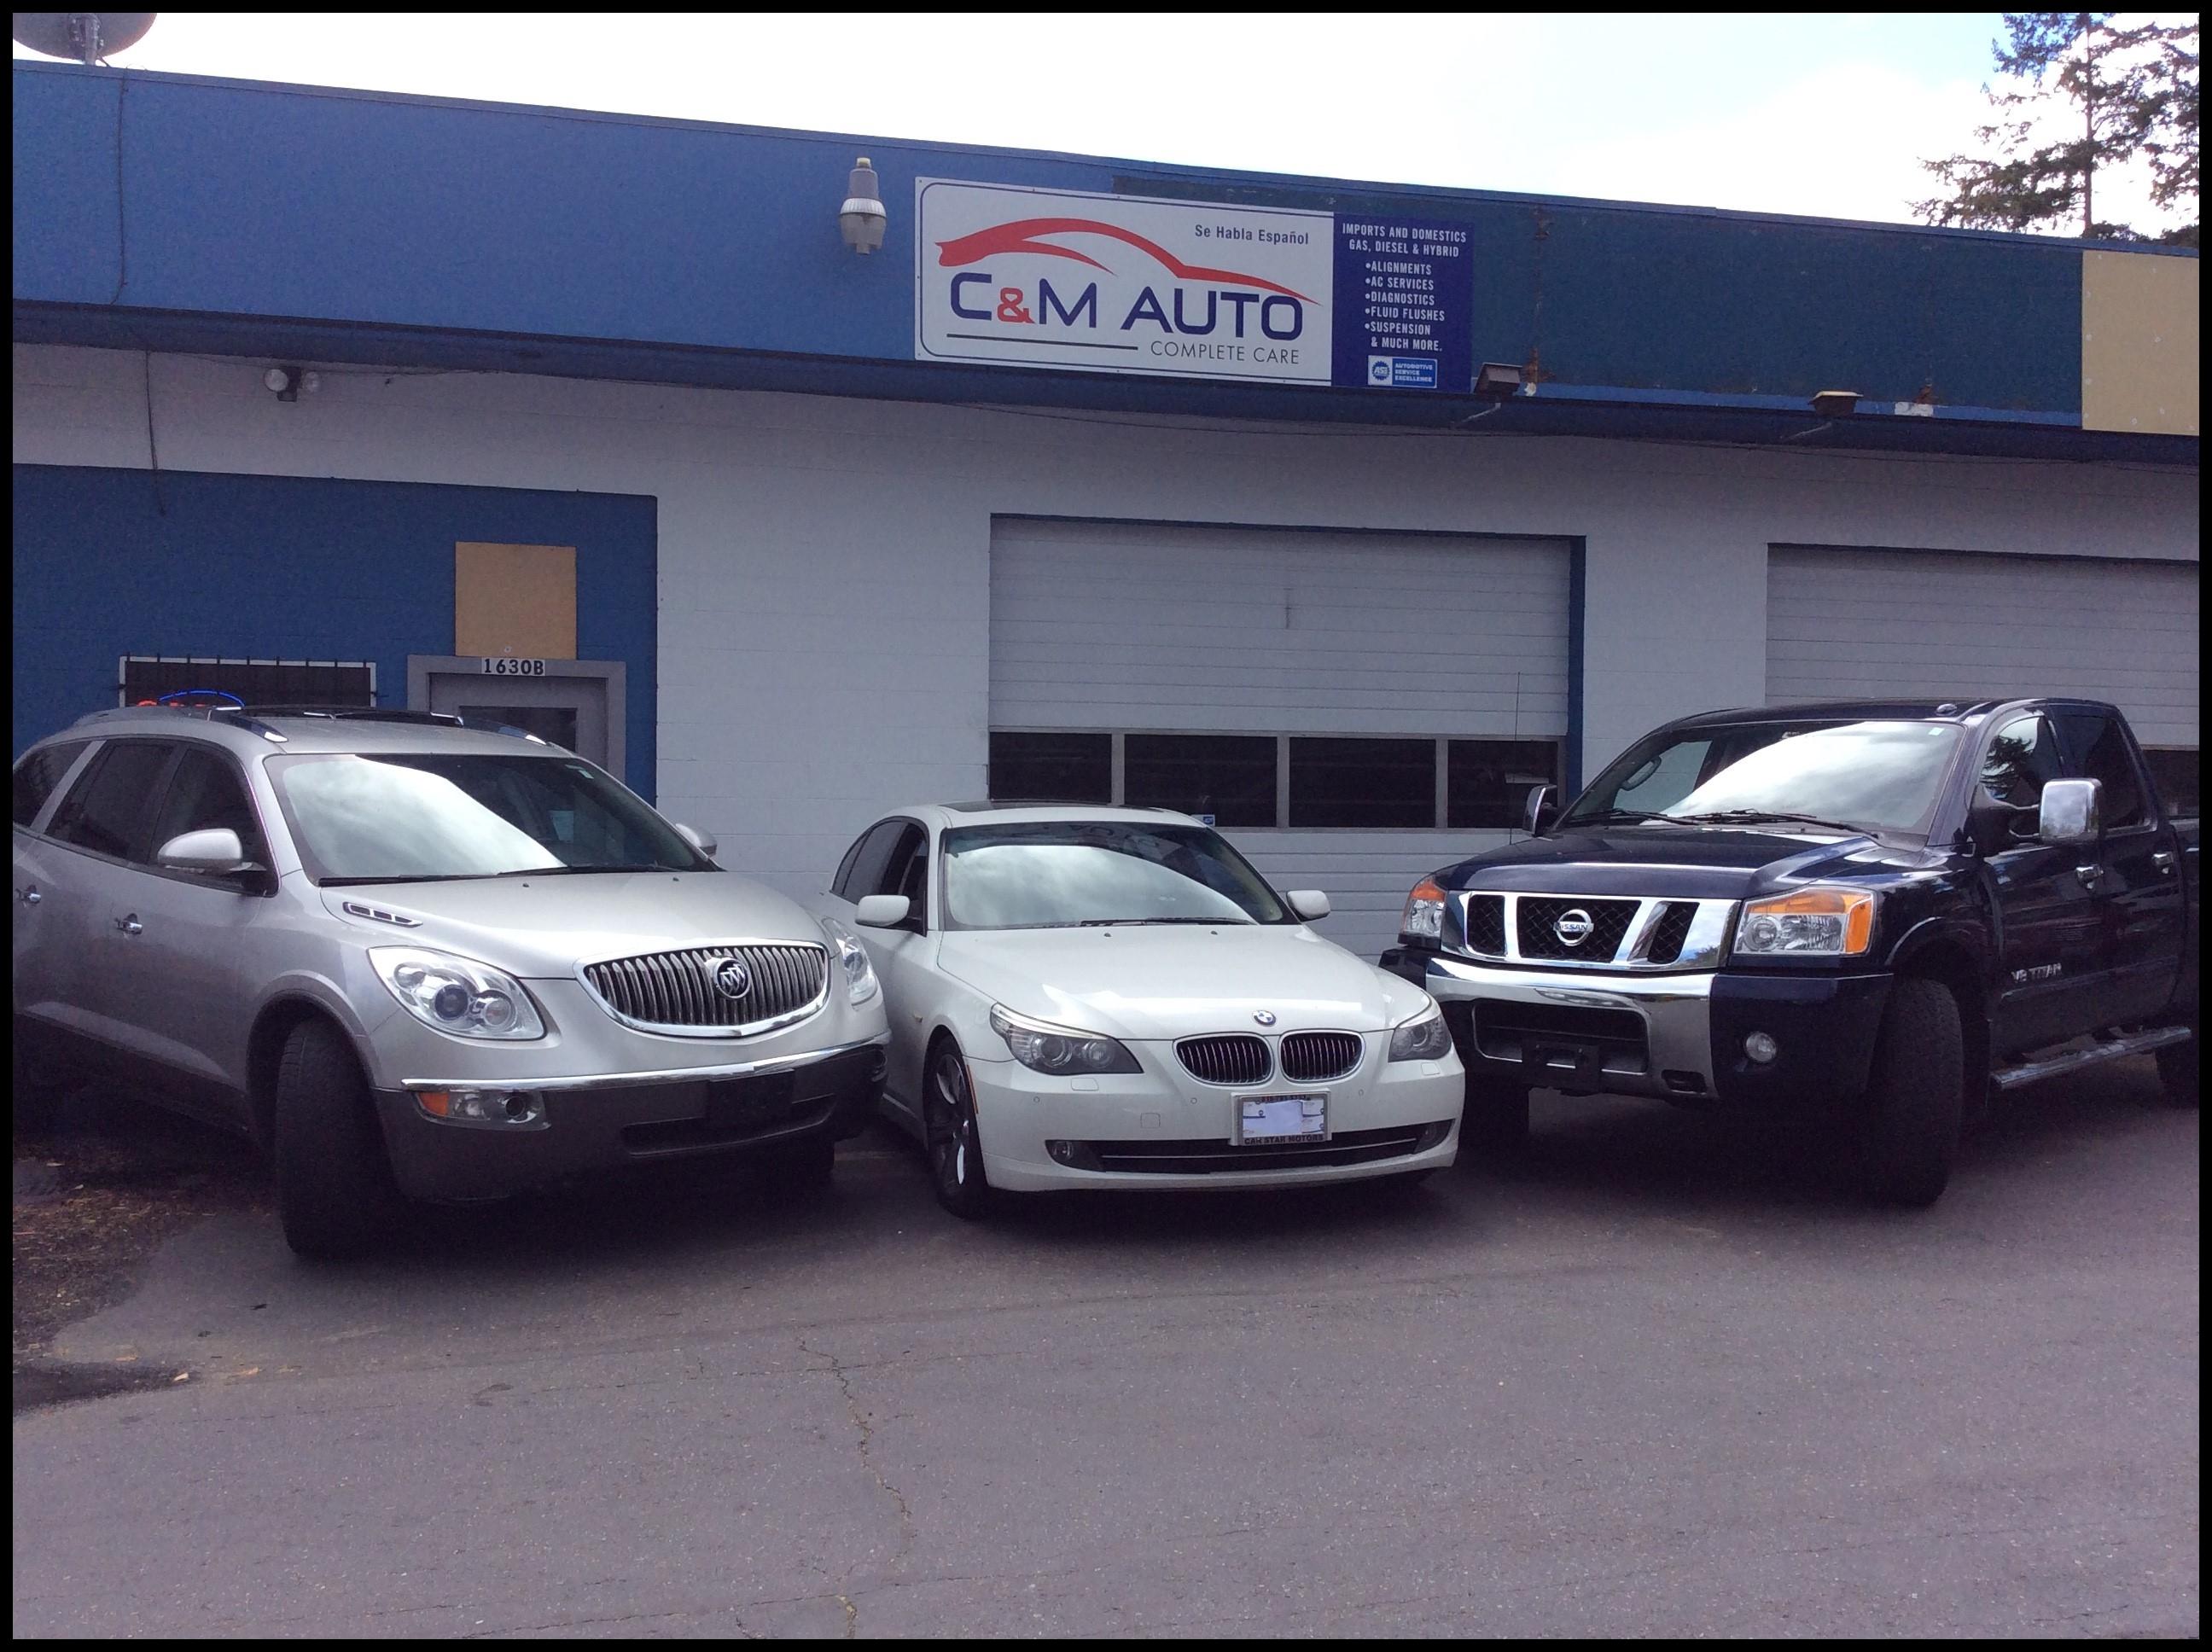 bellevue auto repair bellevue cars c&m auto plete care